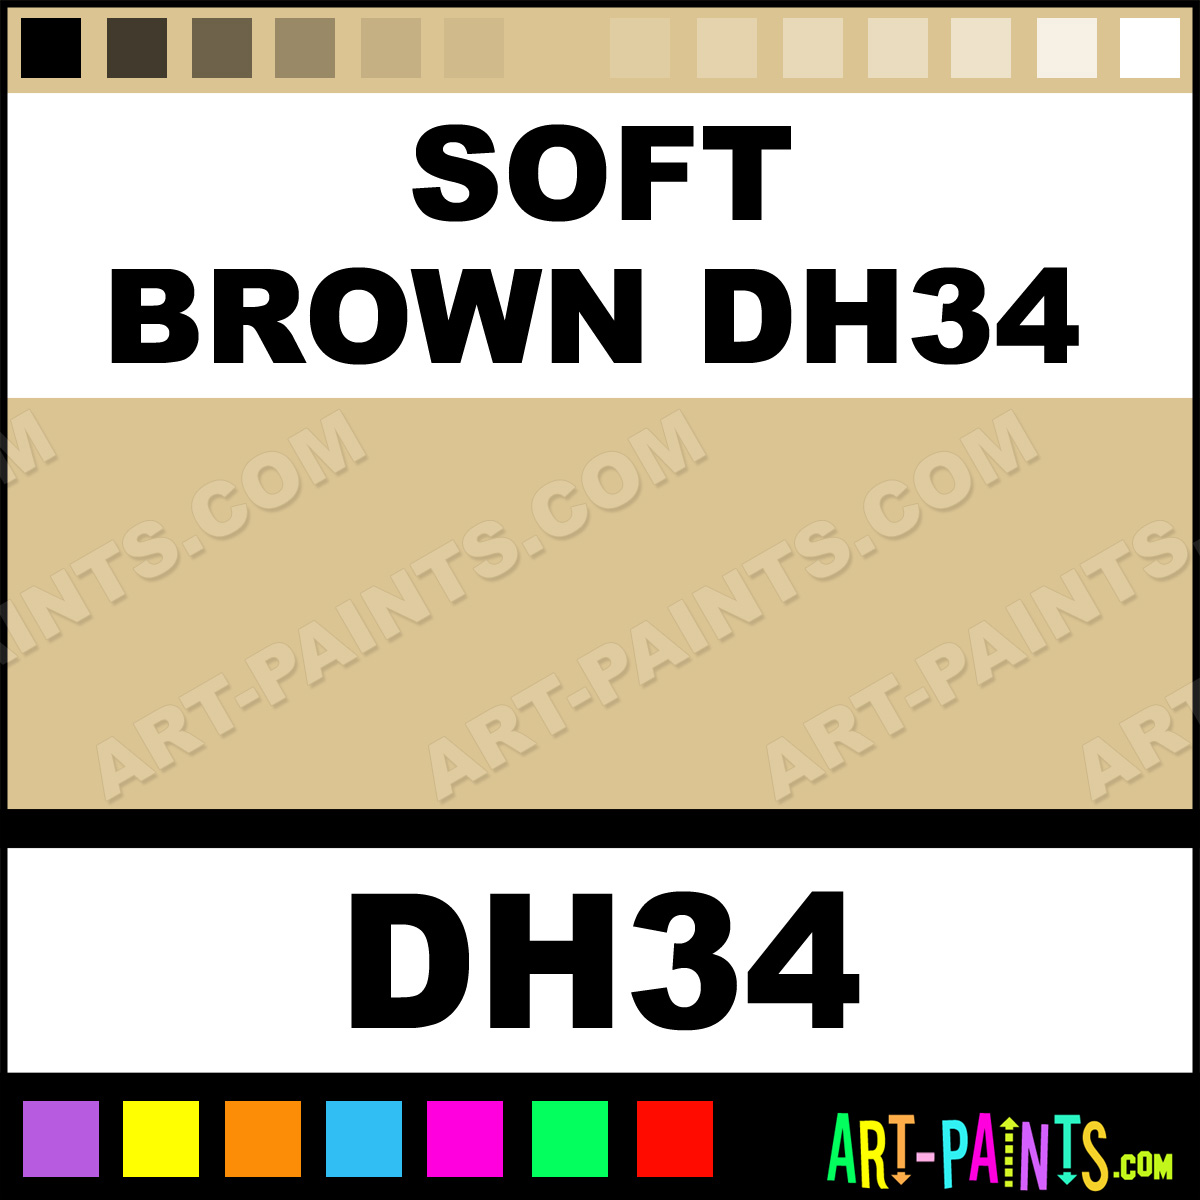 Soft brown dh34 ceramic ceramic paints dh34 soft brown for Soft brown paint colors